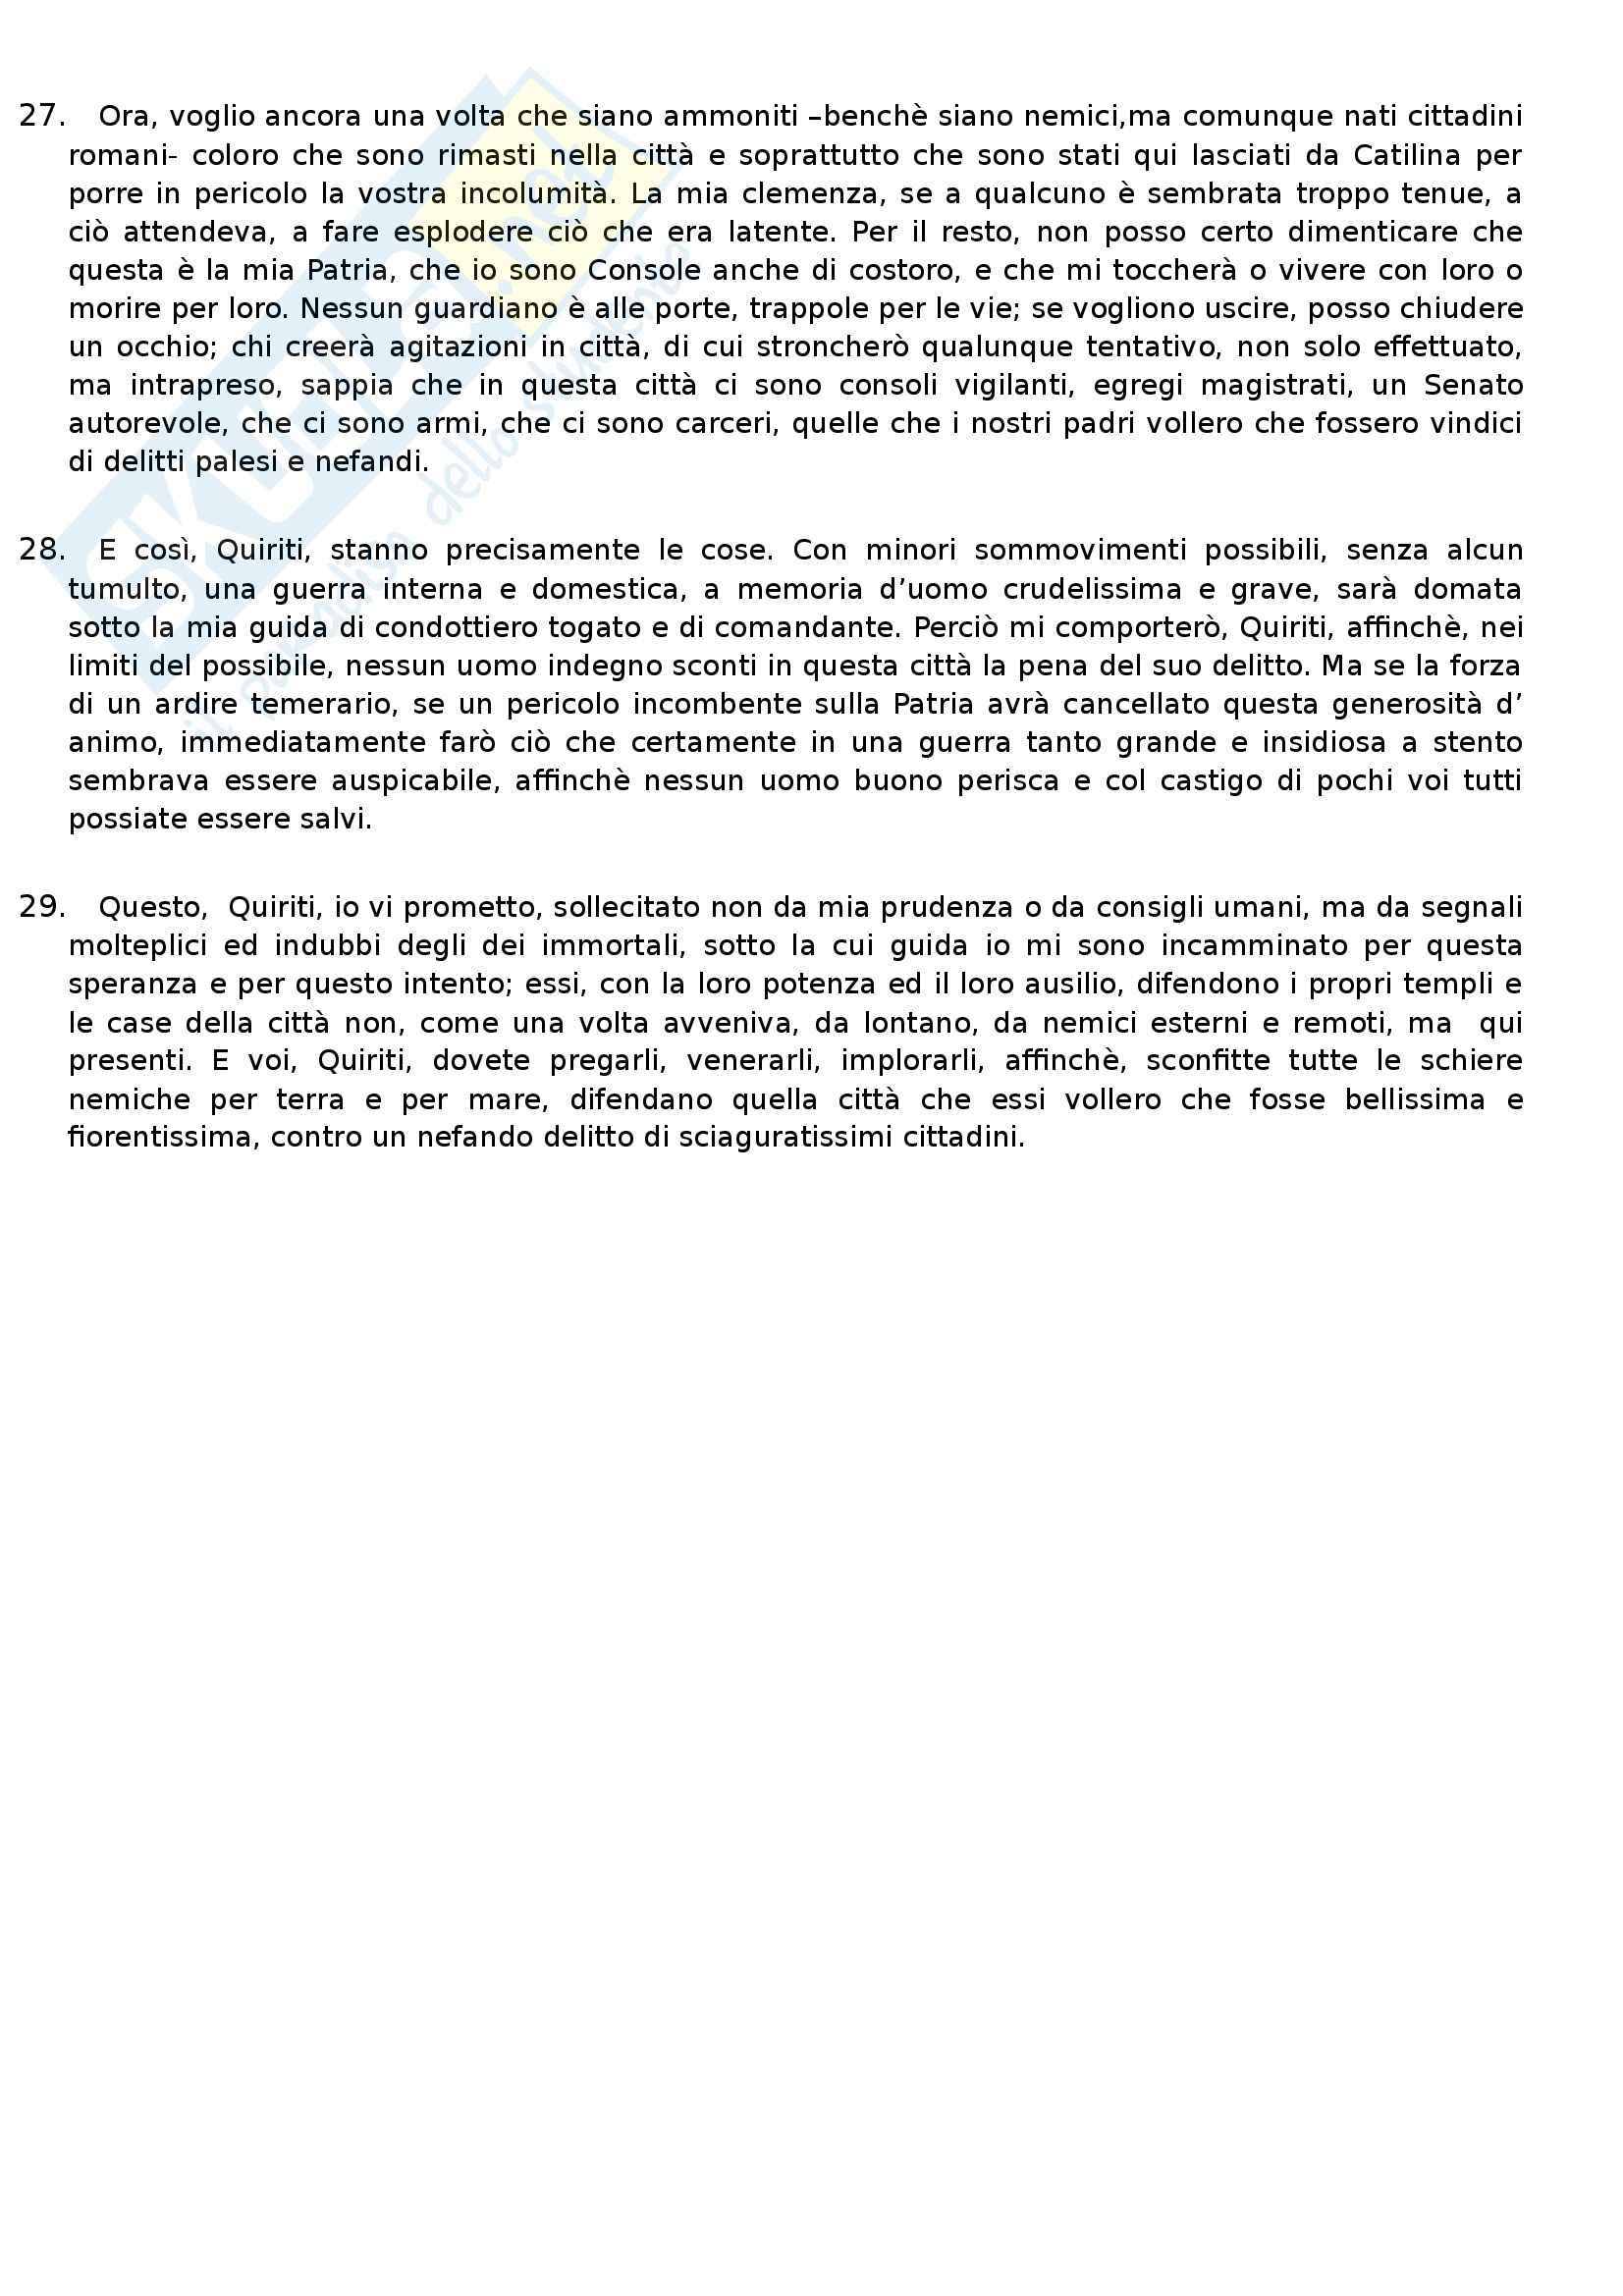 Letteratura latina  - Cicerone, Catilinaria II Pag. 6